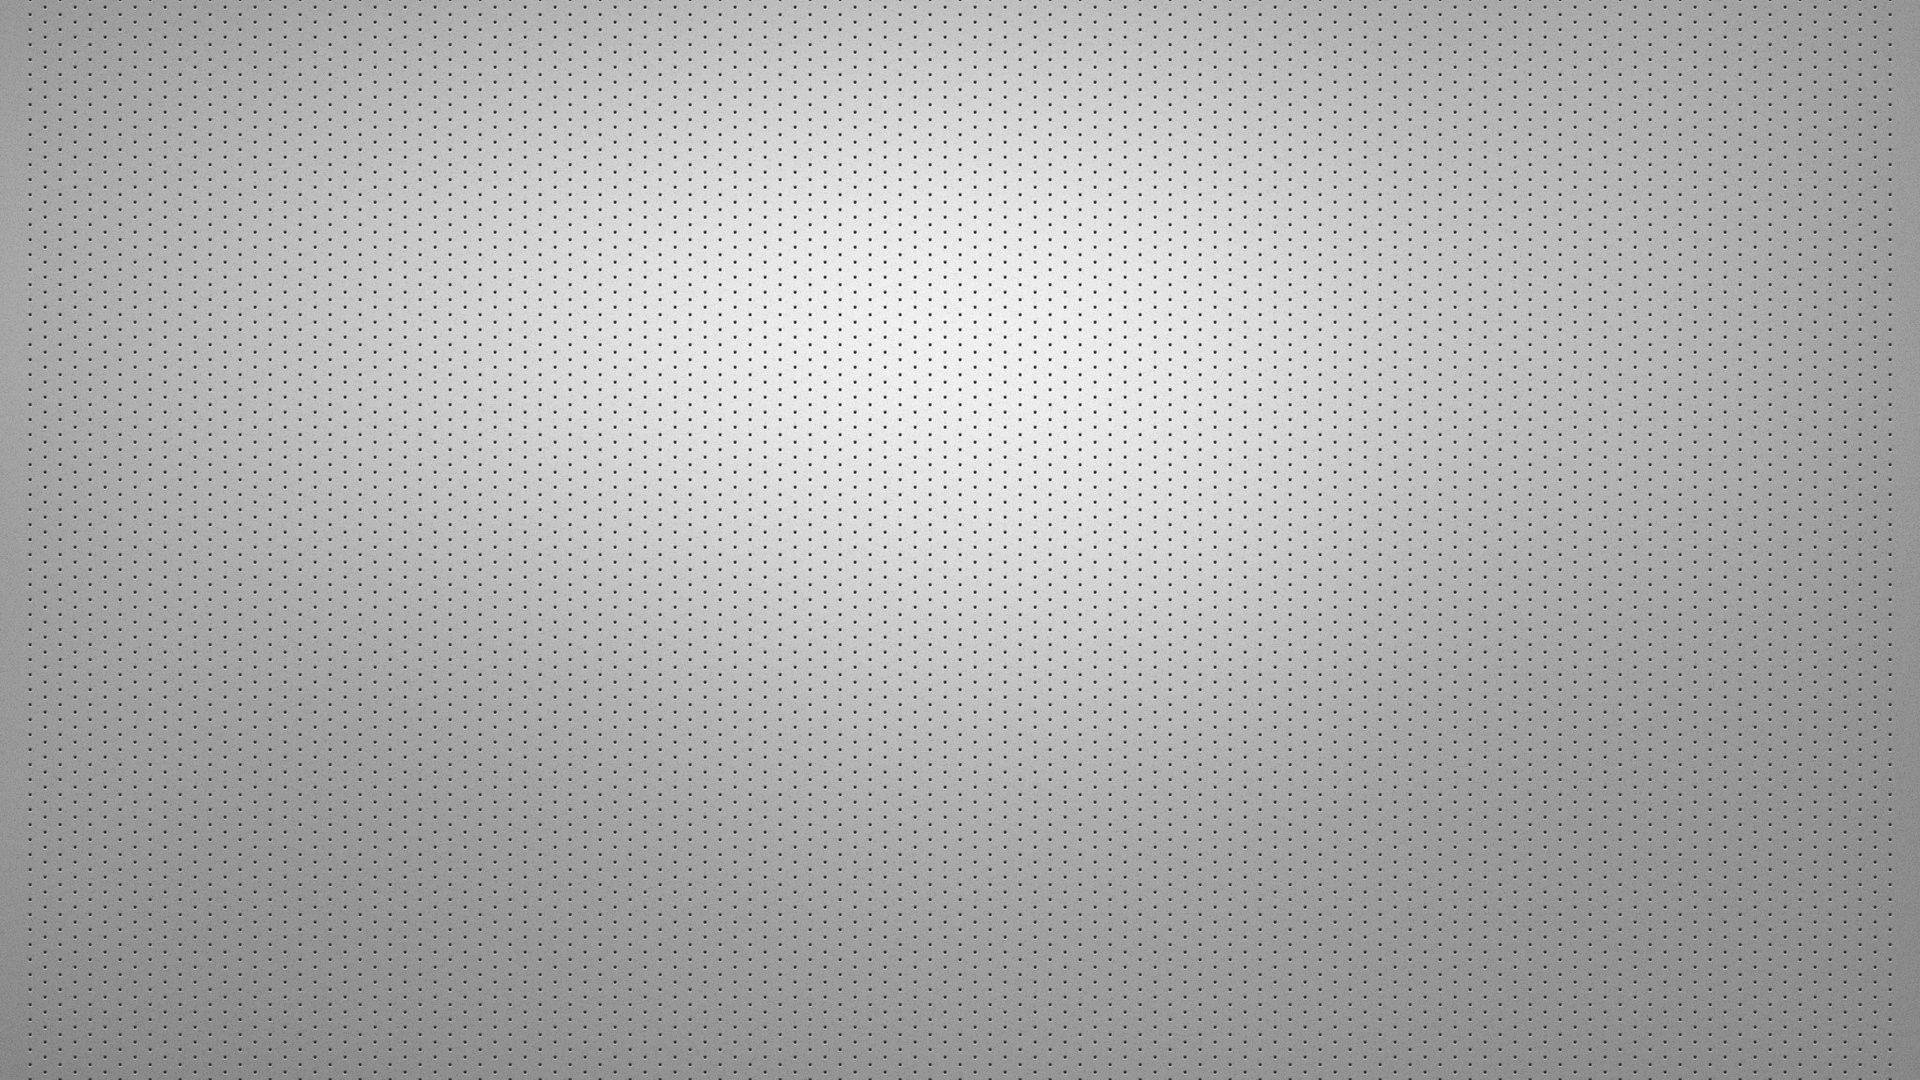 Silver wallpaper download